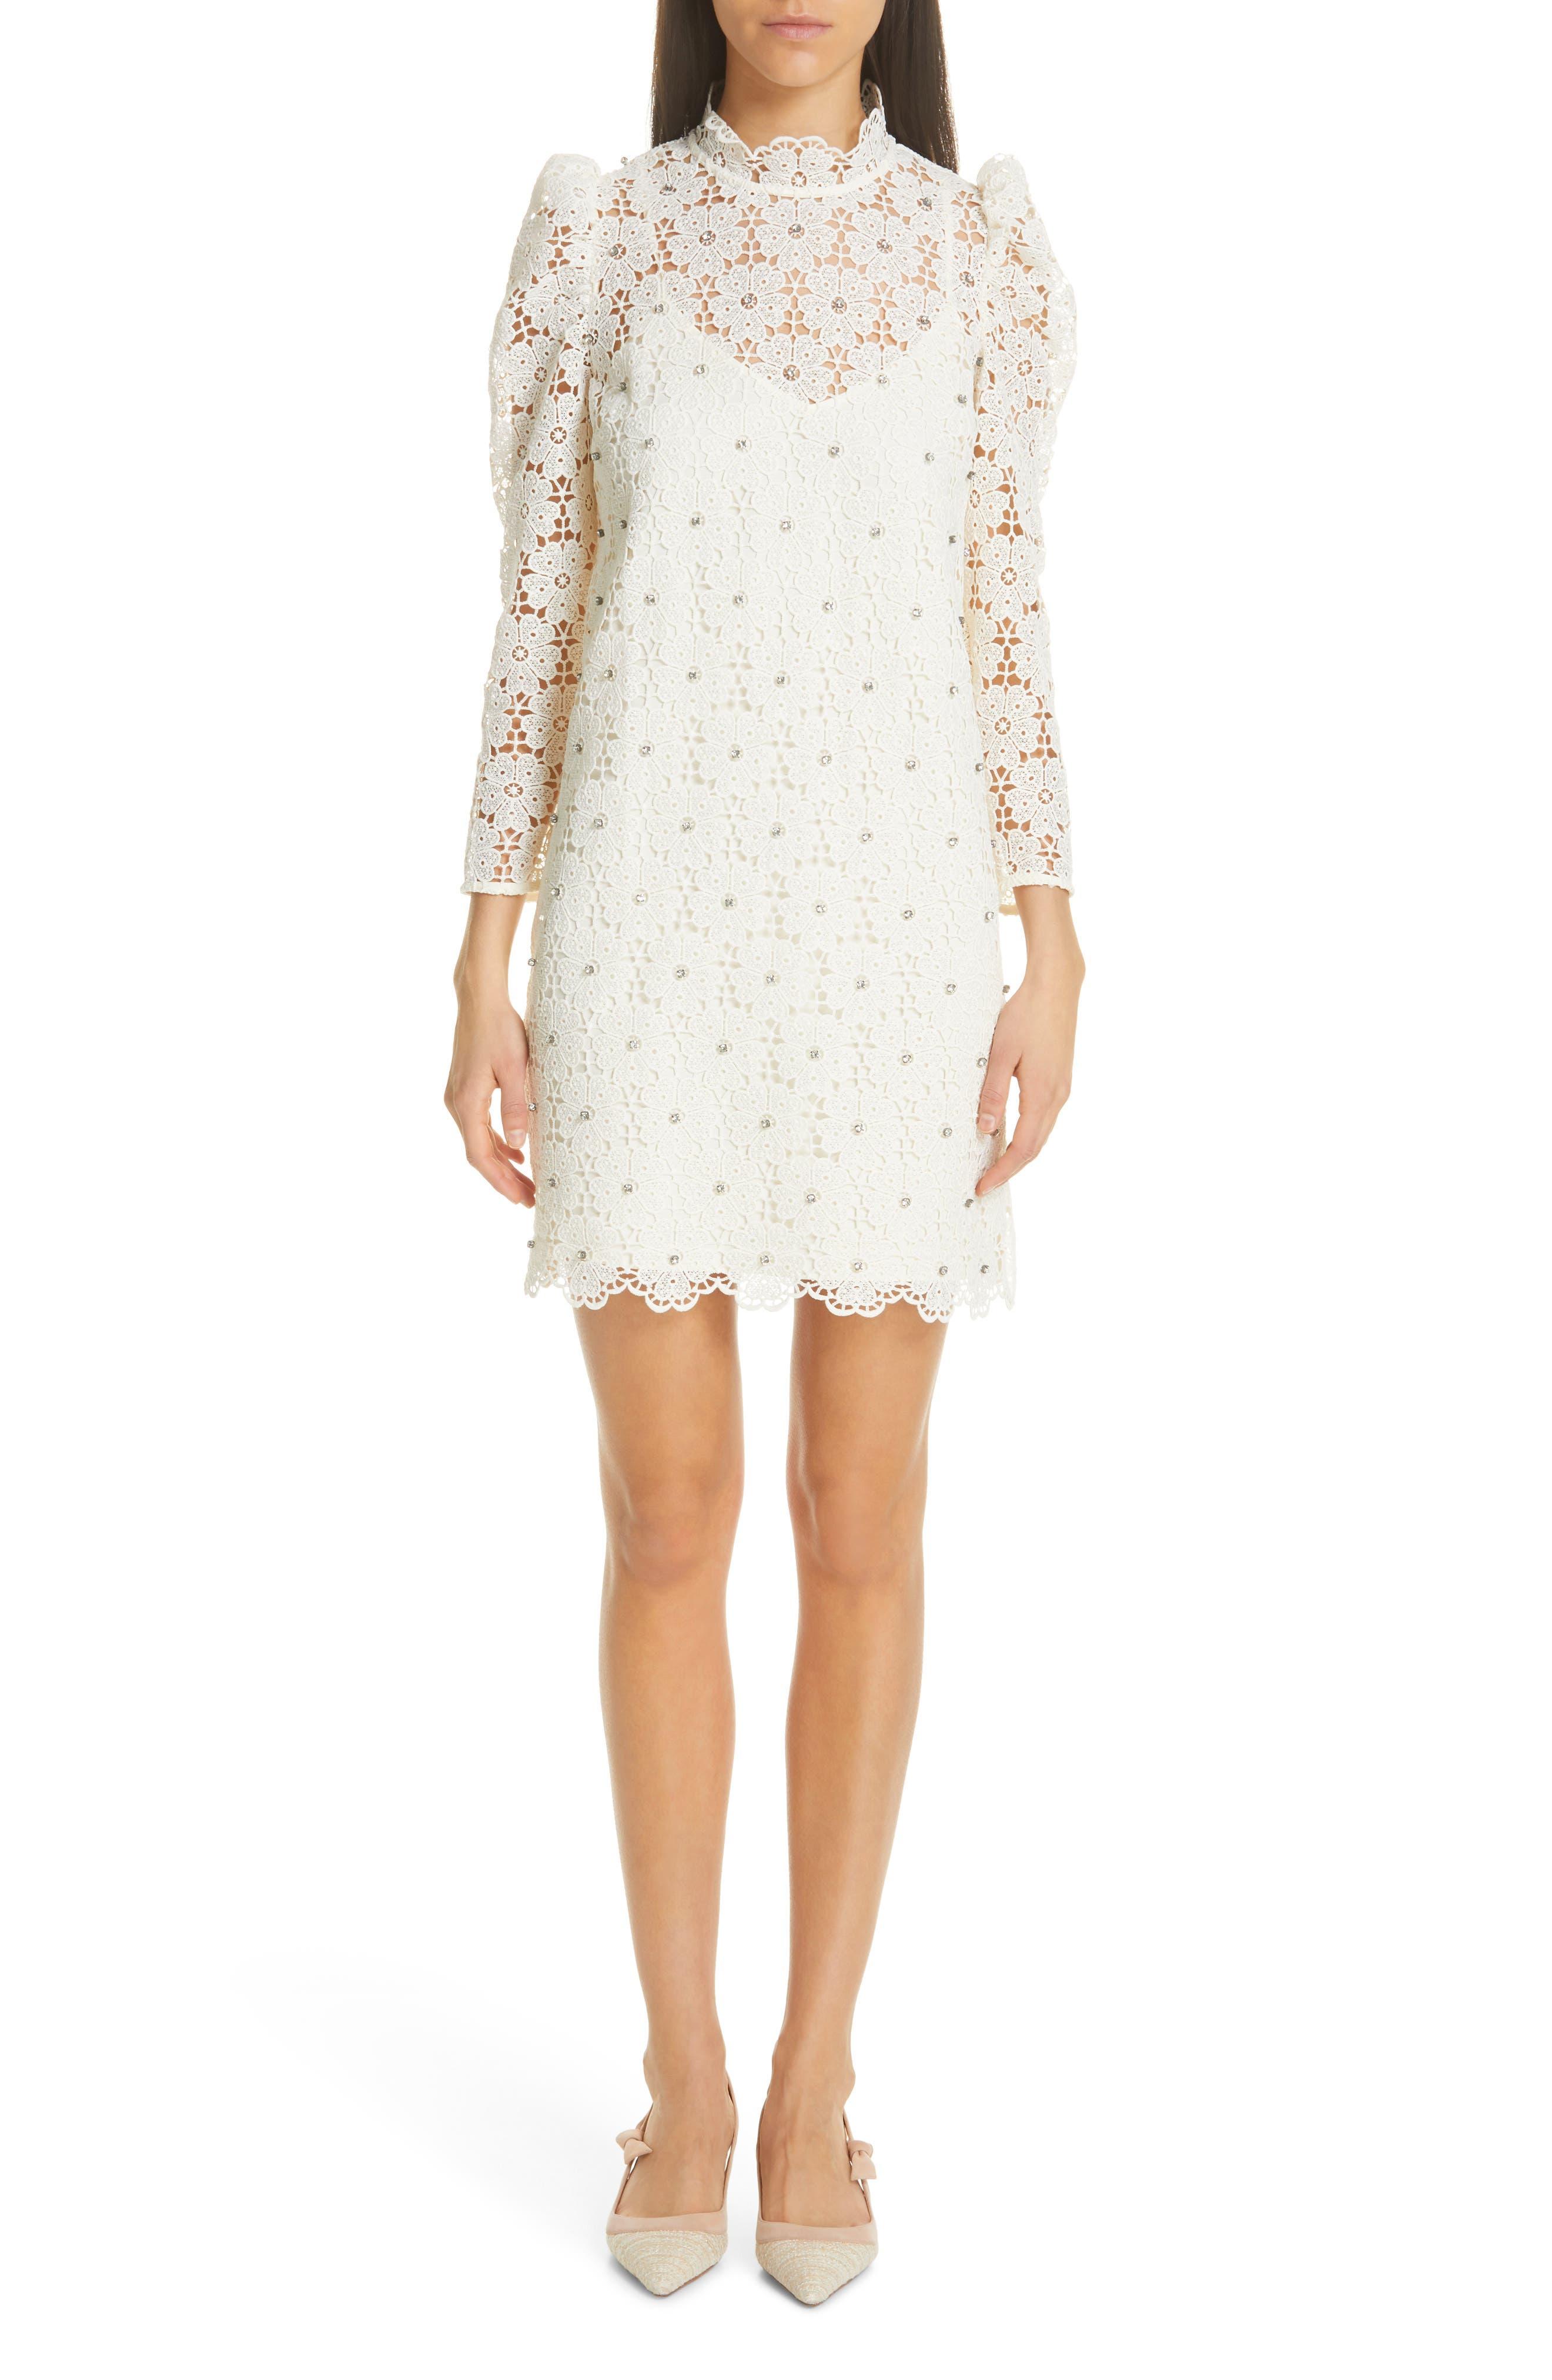 Kate Spade New York Lace Mini Dress, White